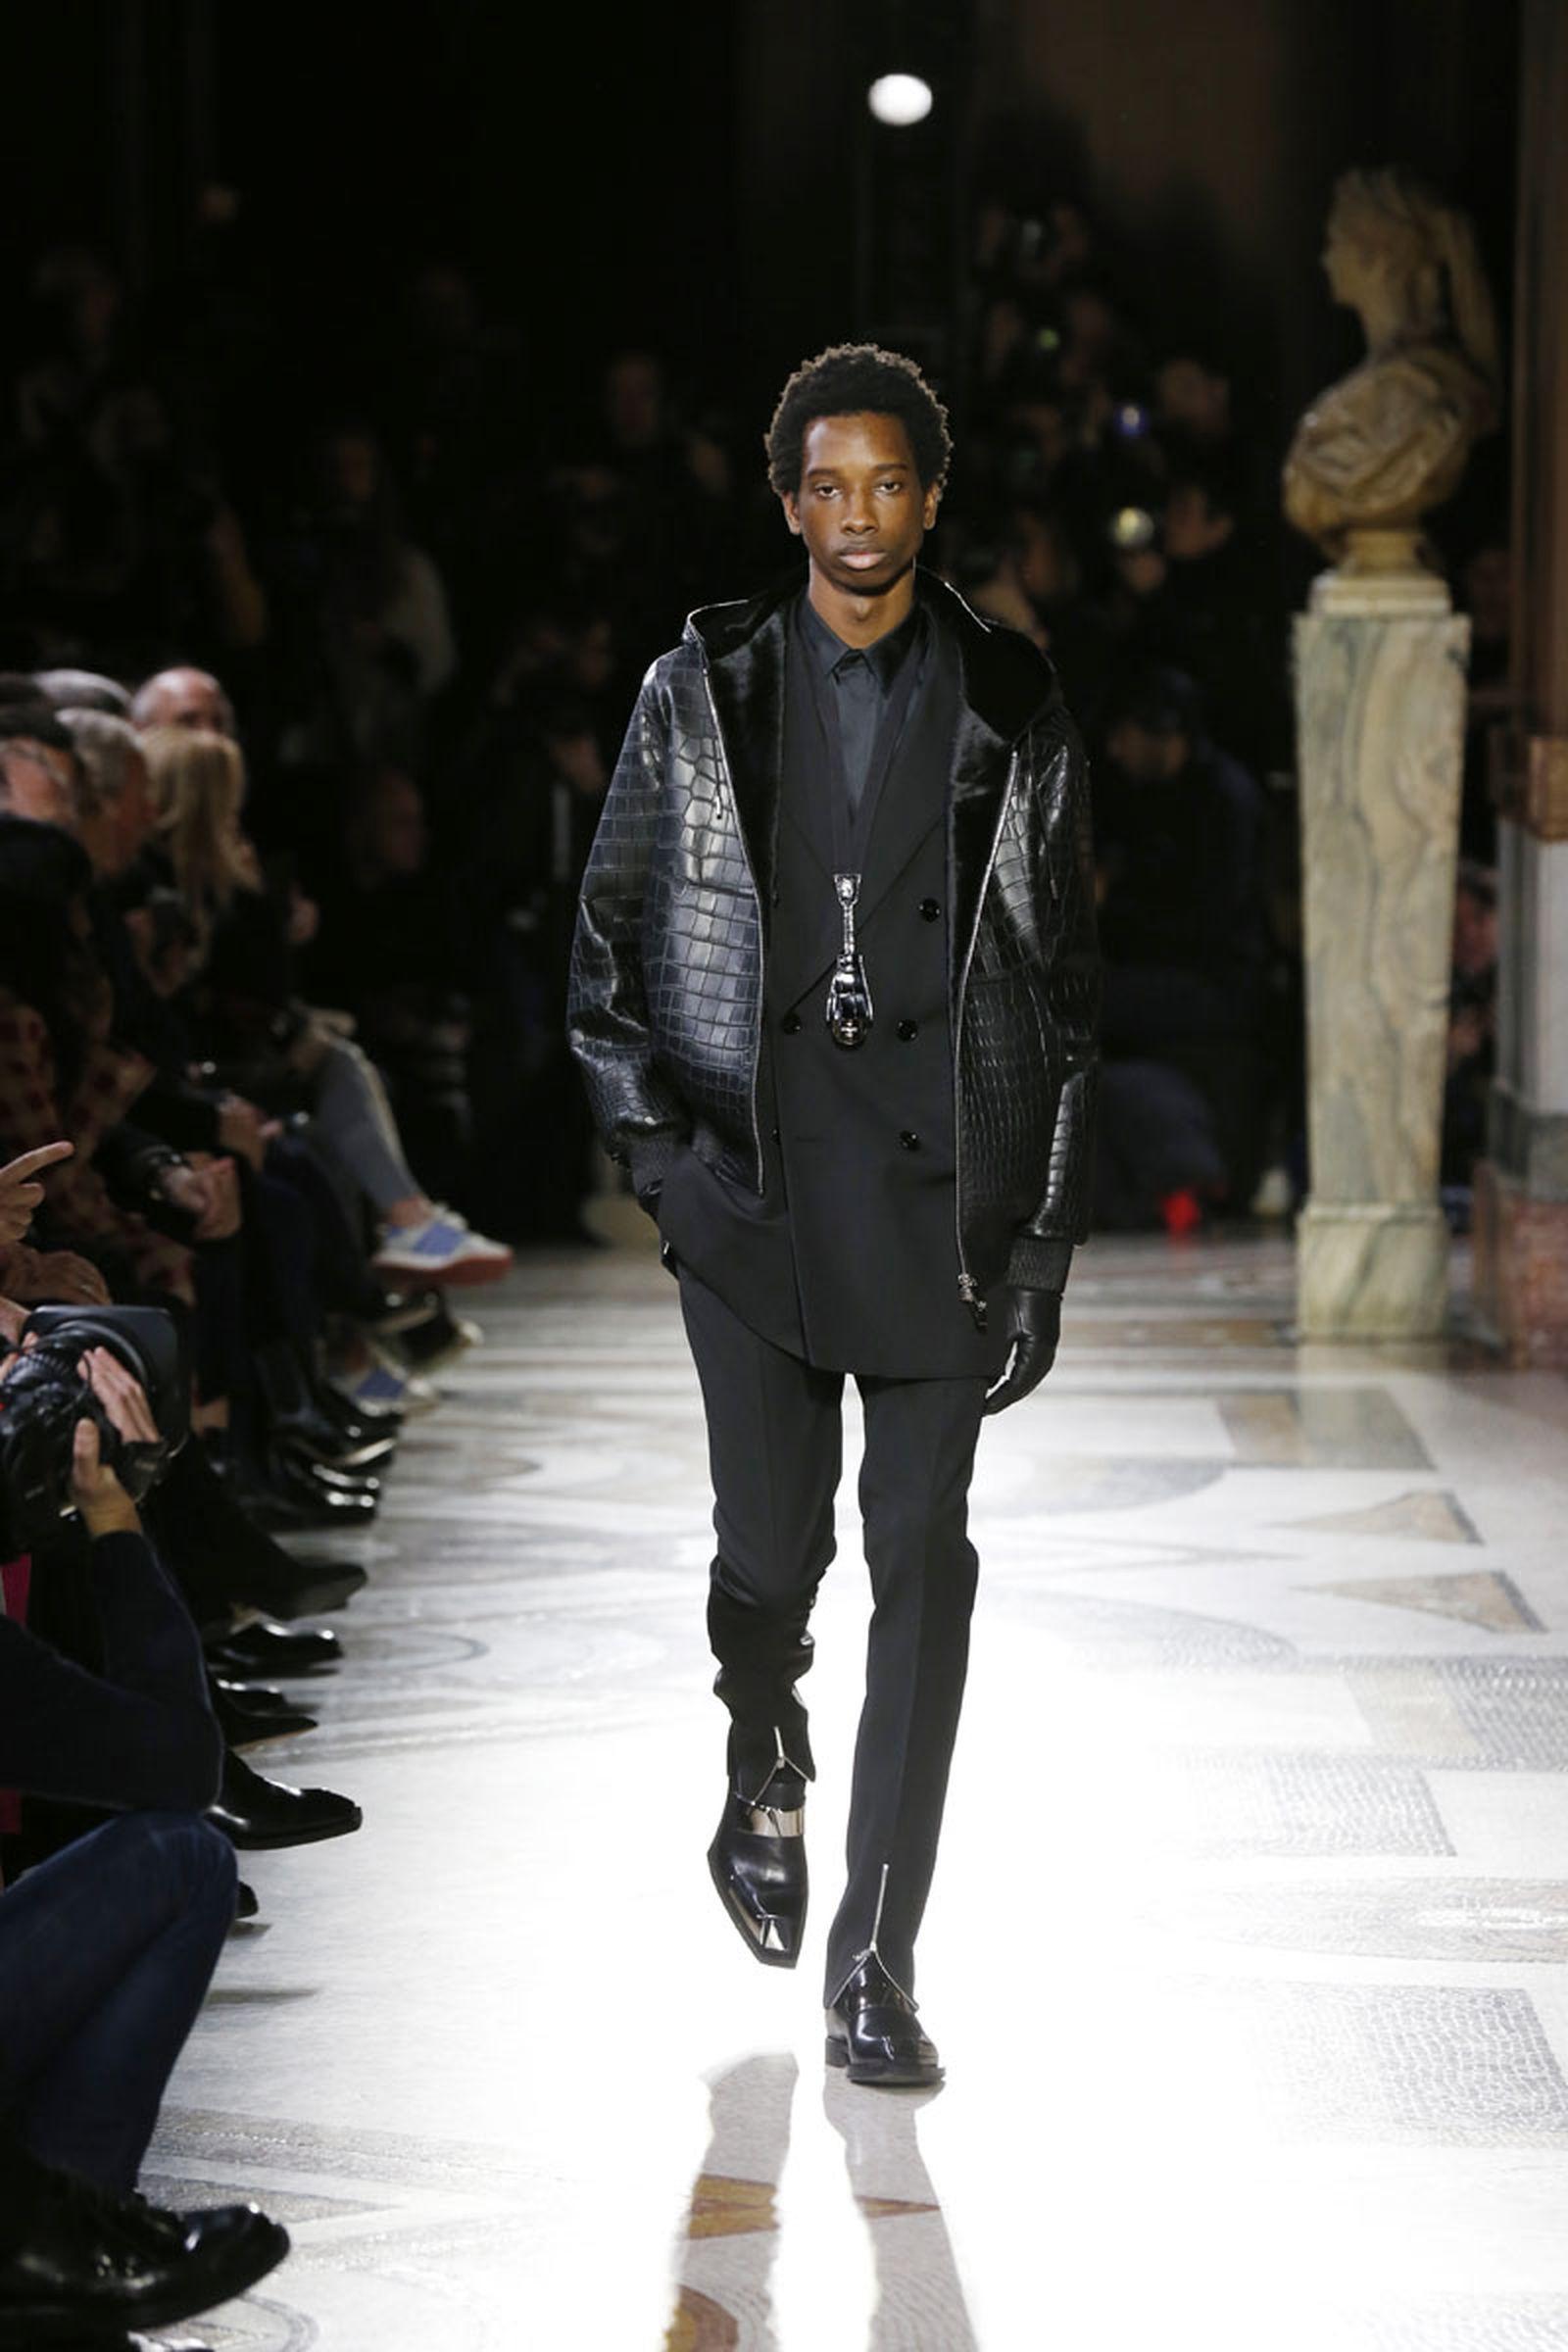 35berluti fw19 paris fashion week pfw19 runway